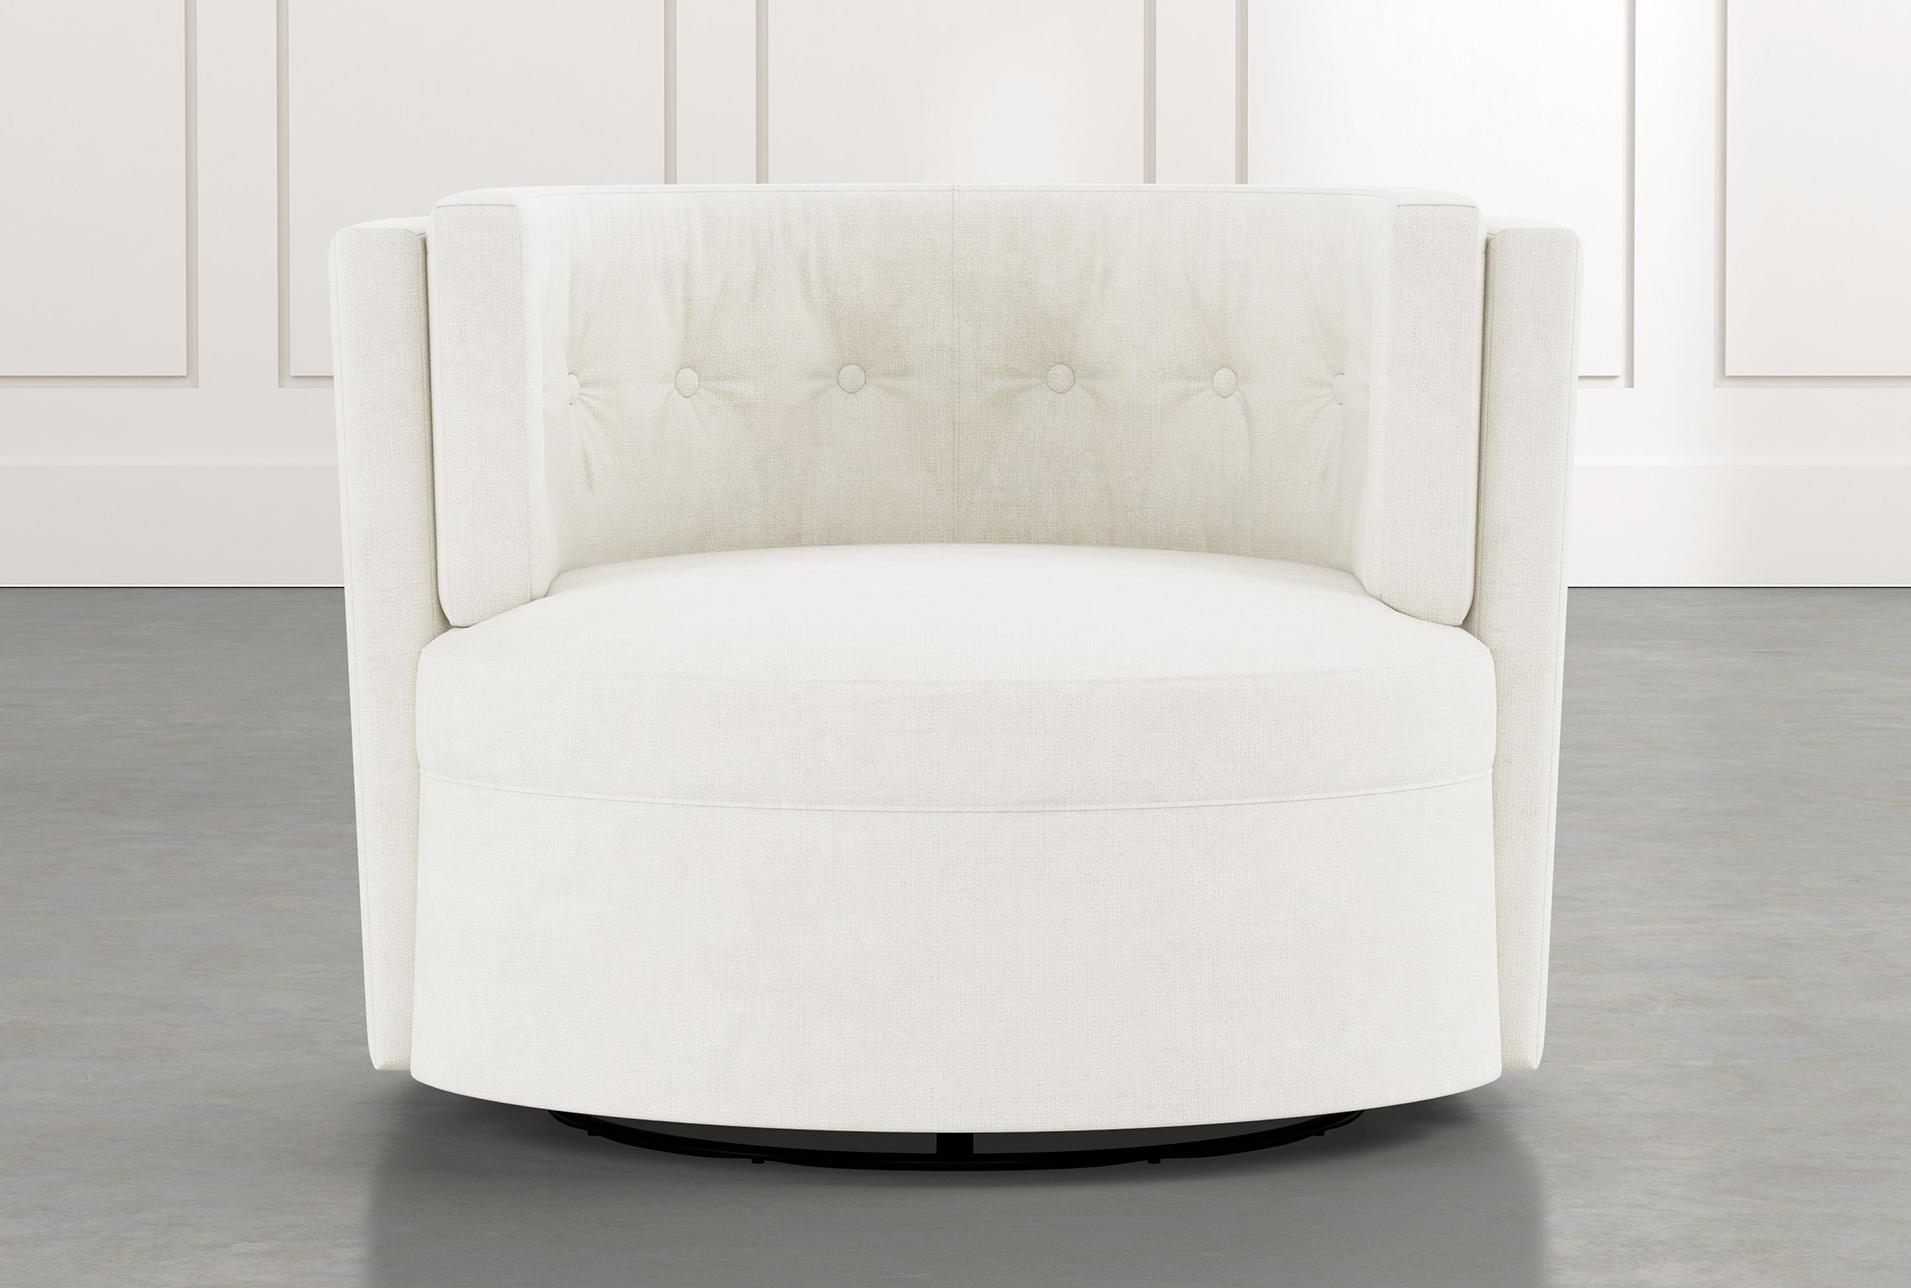 Aidan Ii White Swivel Accent Chair In 2020 White Swivel Accent Chair Oversized Chair Living Room White Swivel Chairs